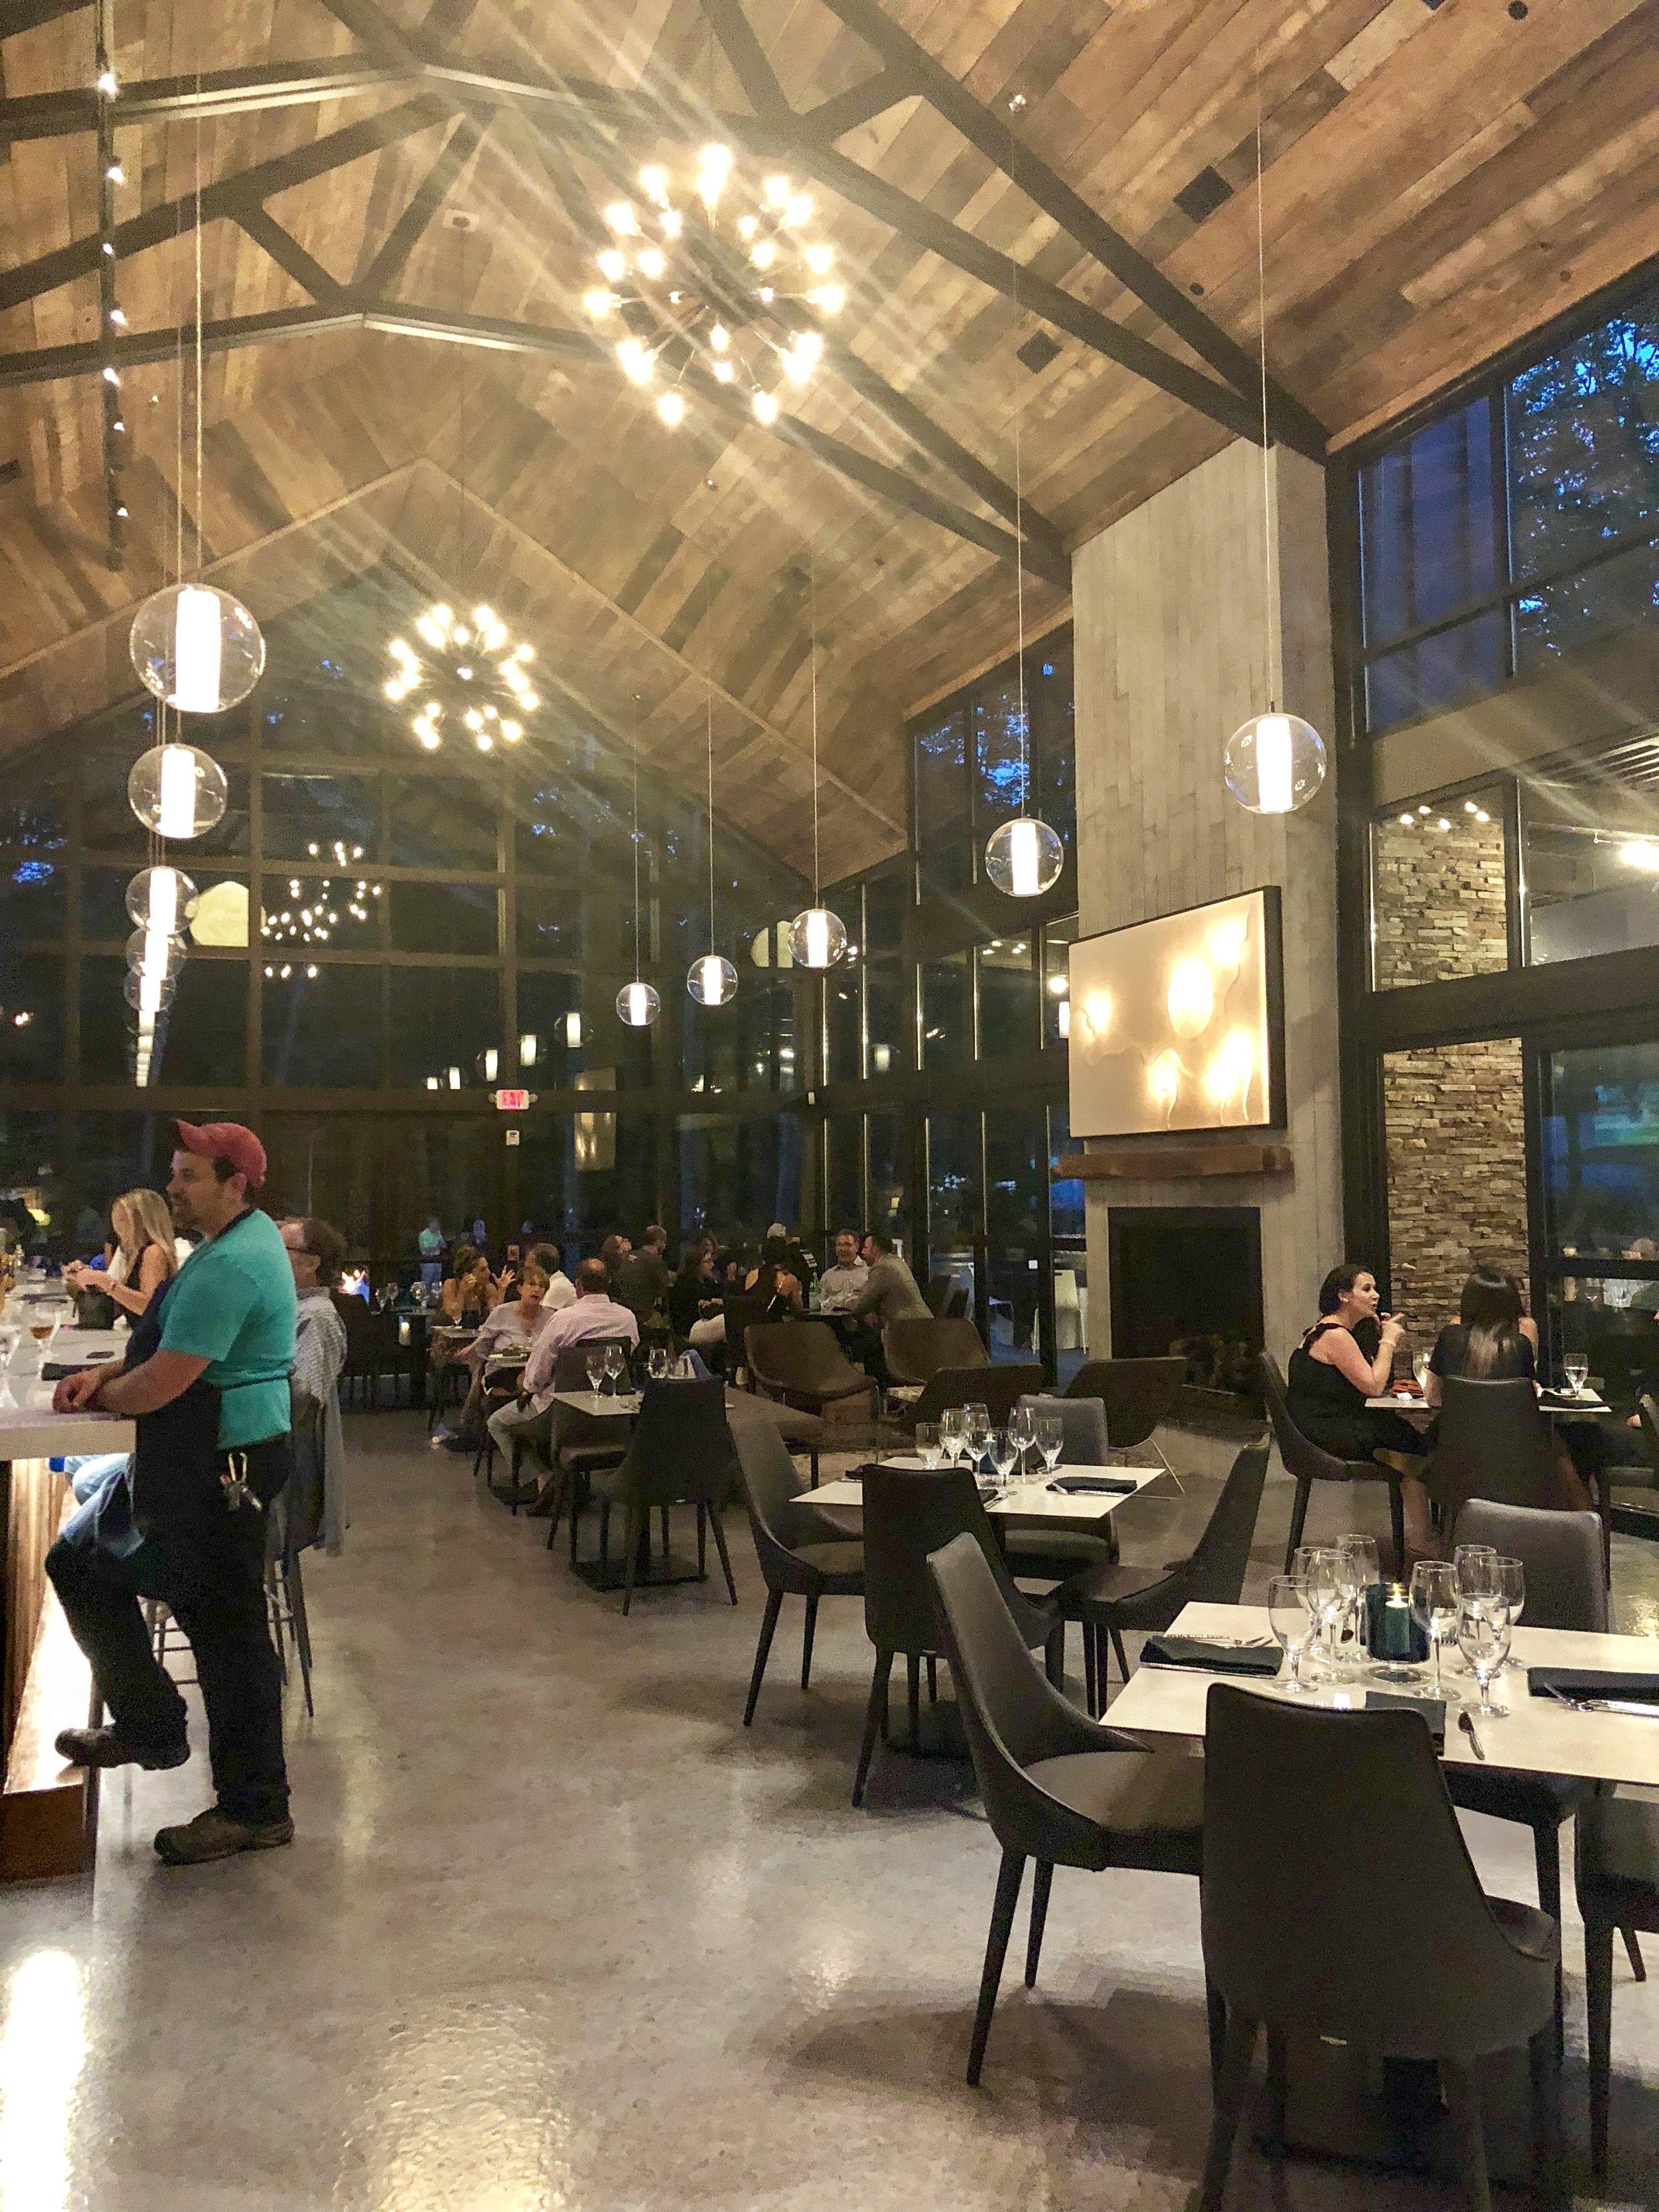 The Main Floor Dining Area